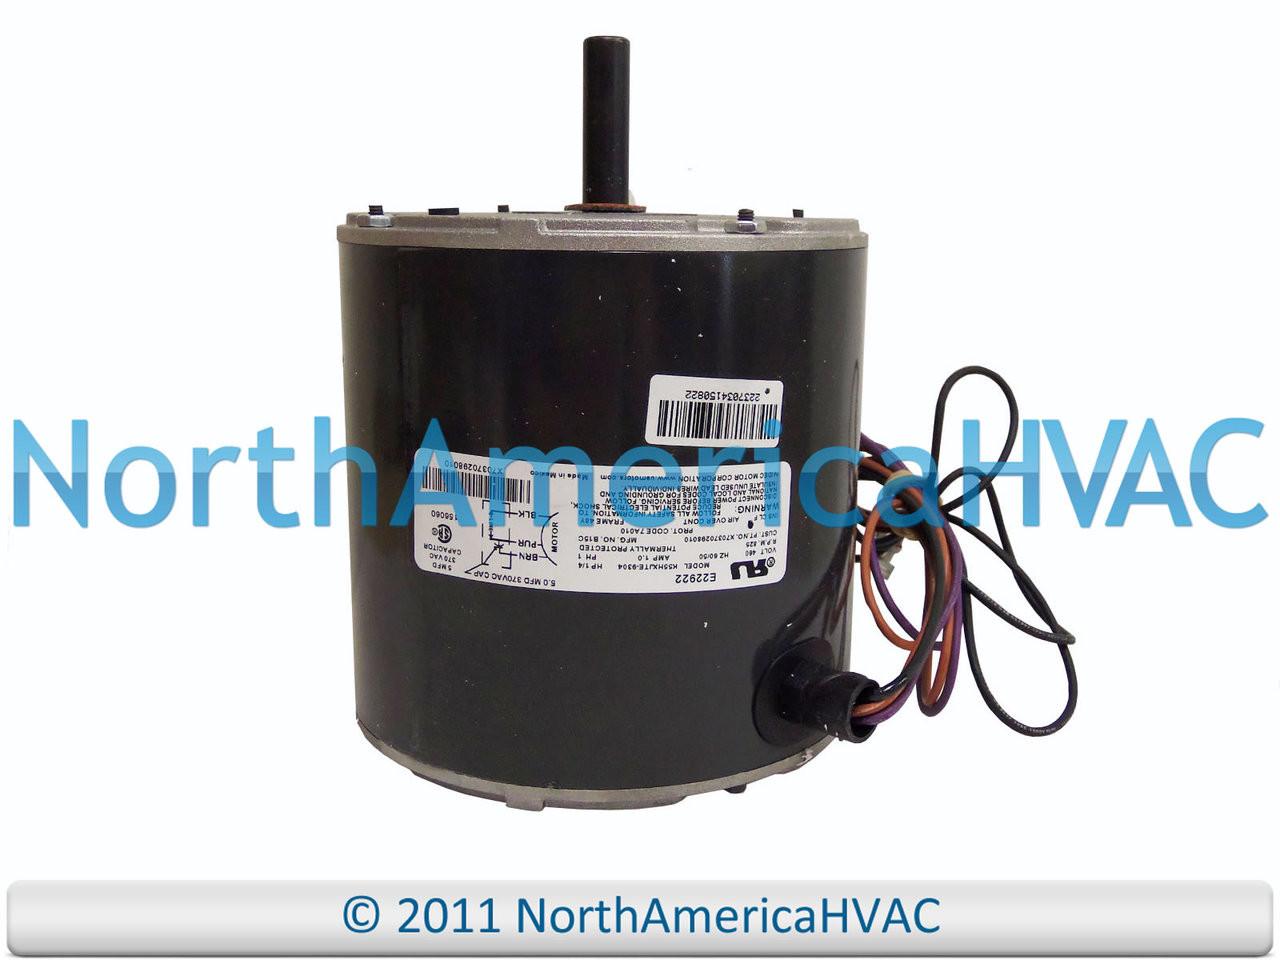 emerson trane american standard fan motor 1 6 hp 460 k55hxjte 9304 x70370298010 north america distribution sellersburg heating [ 1280 x 960 Pixel ]